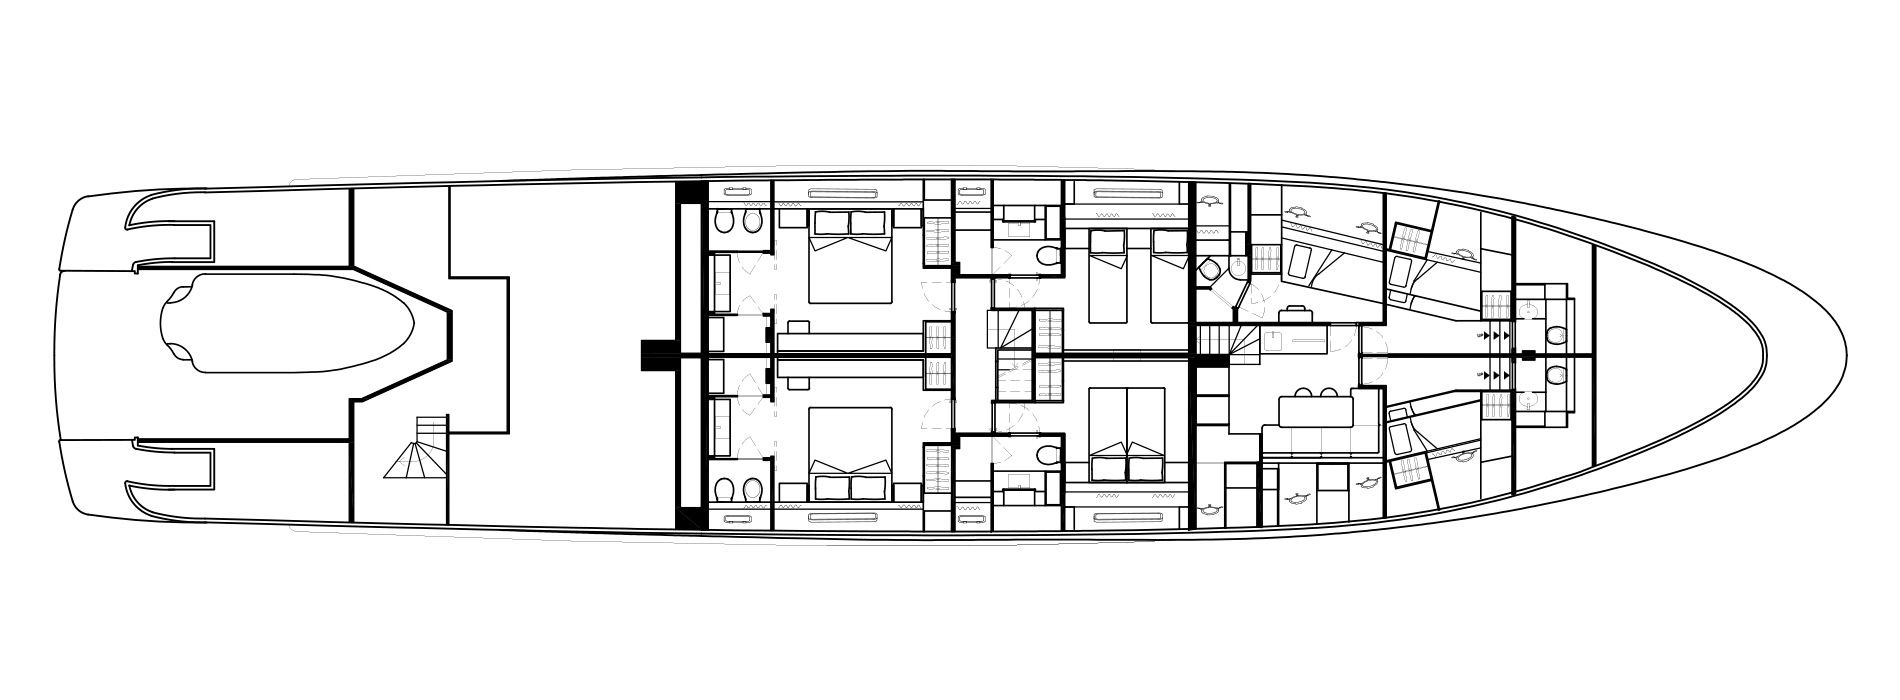 Sanlorenzo Yachts SD126 Нижняя палуба версия A bis